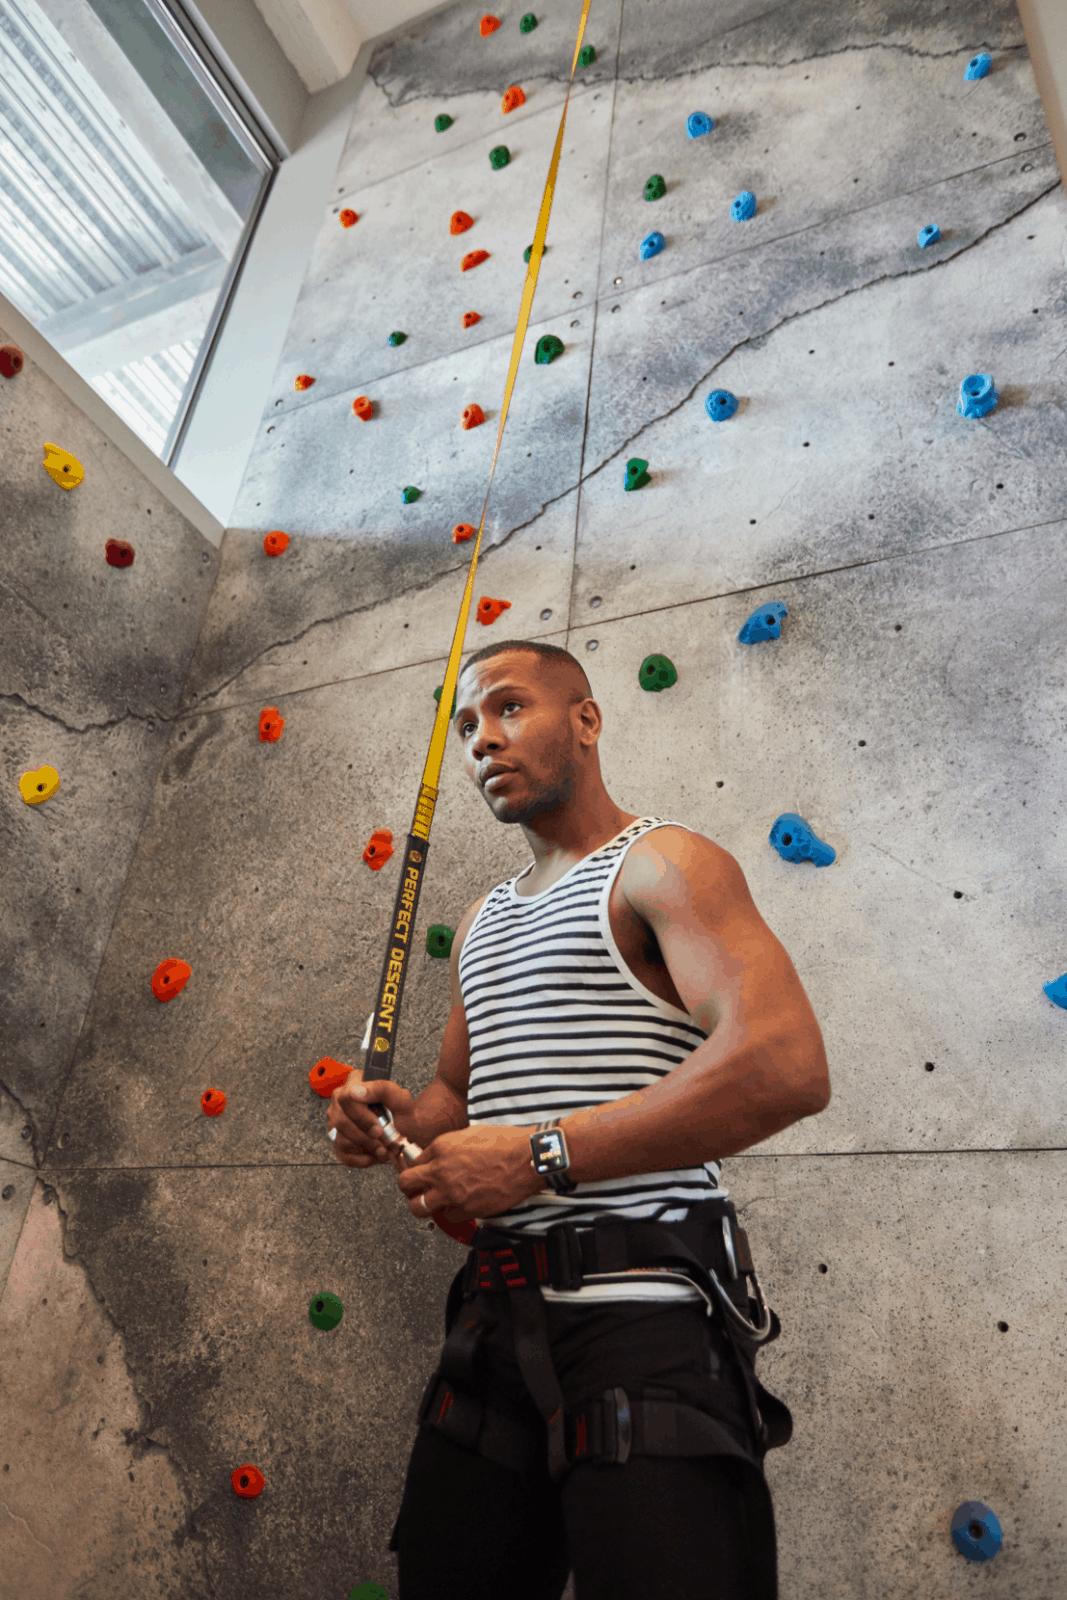 Rock Climbing at Fitler Club Philadelphia